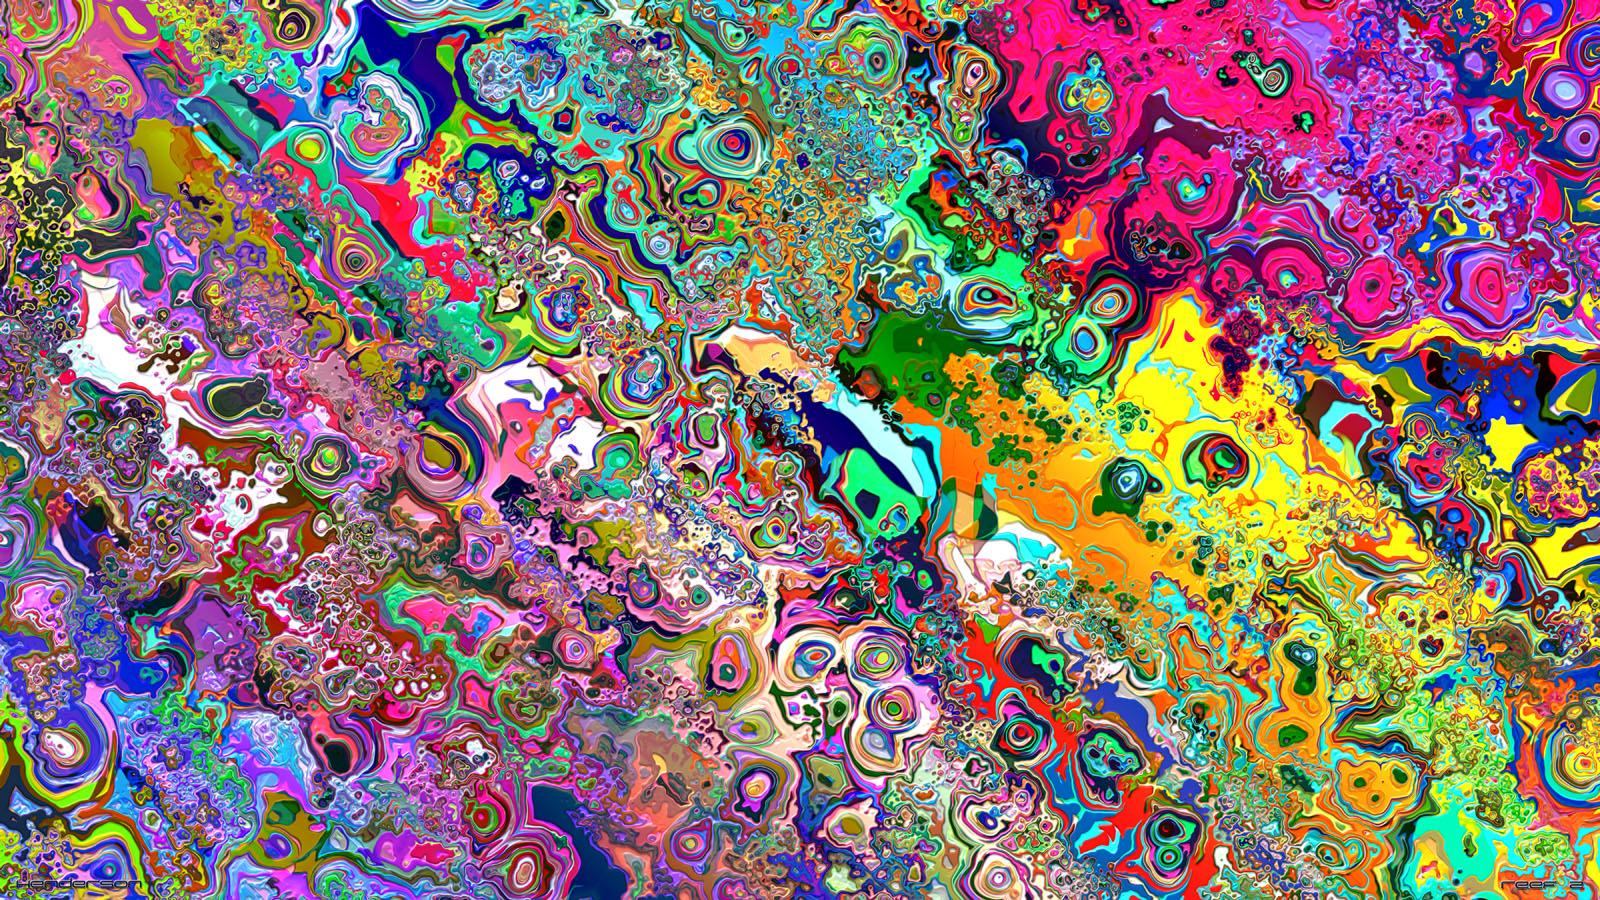 Psychedelic Computer Wallpapers Desktop Backgrounds 1600x900